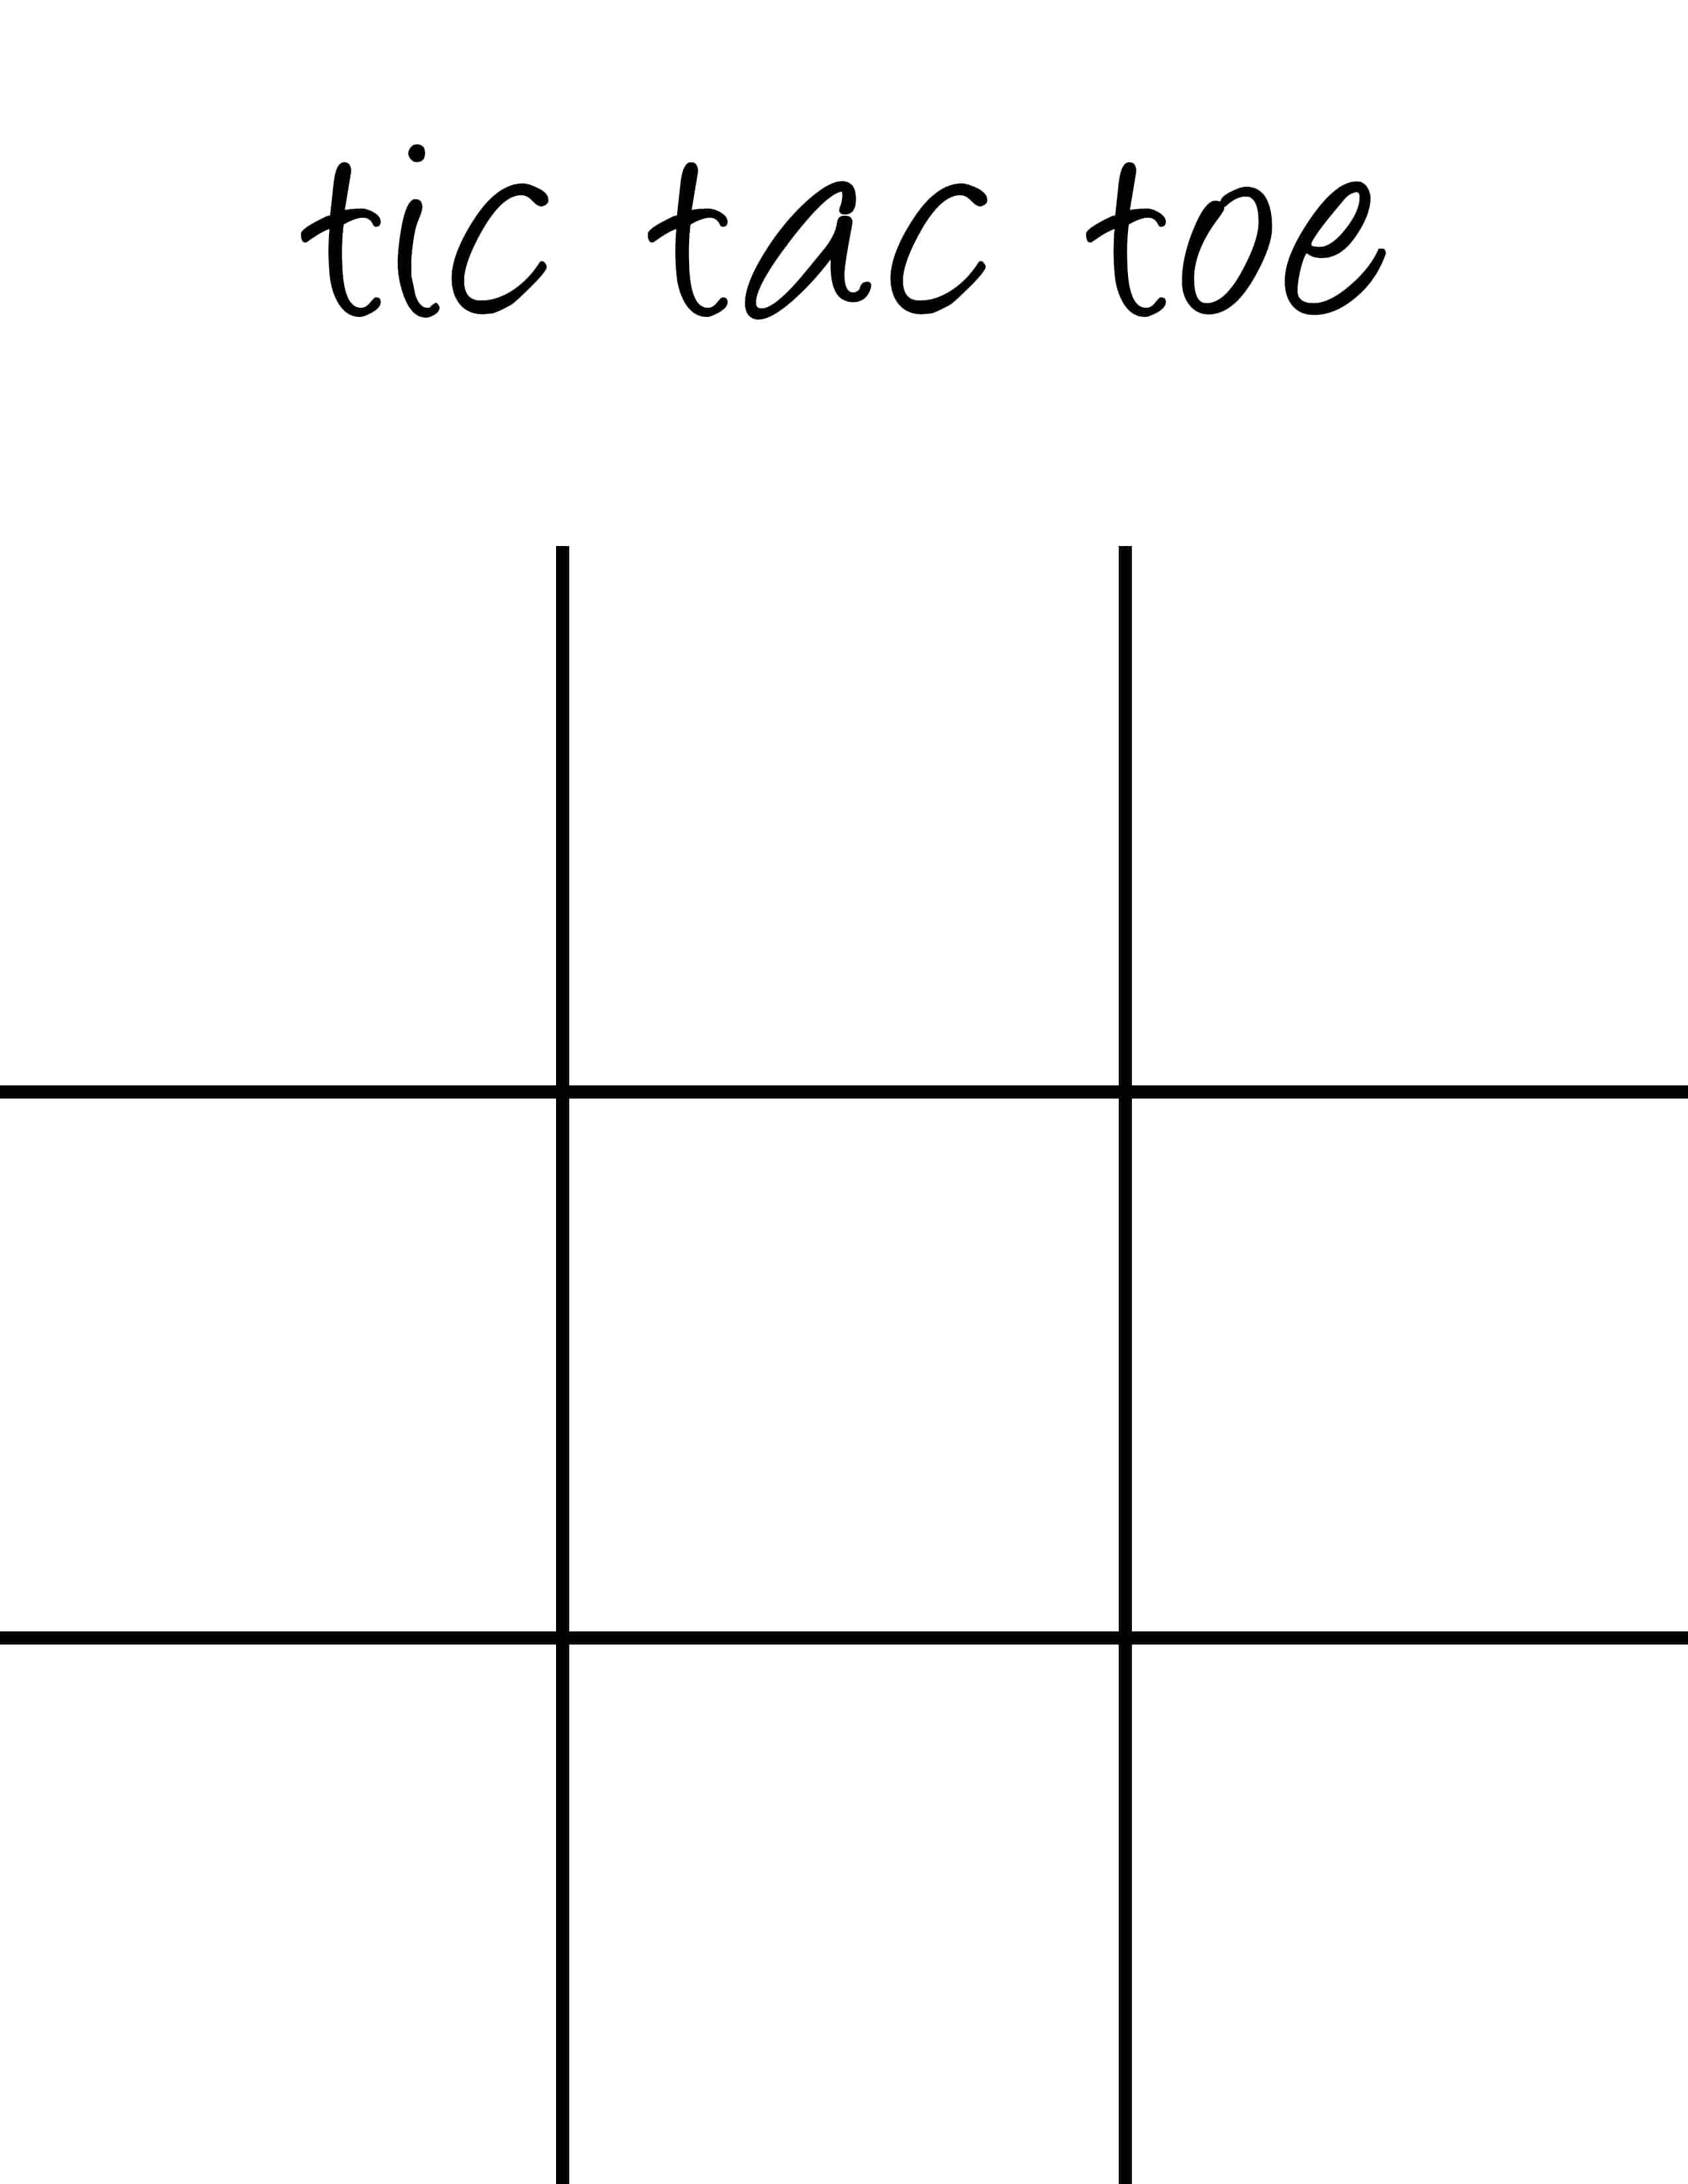 Tic Tac Toe Board Printable